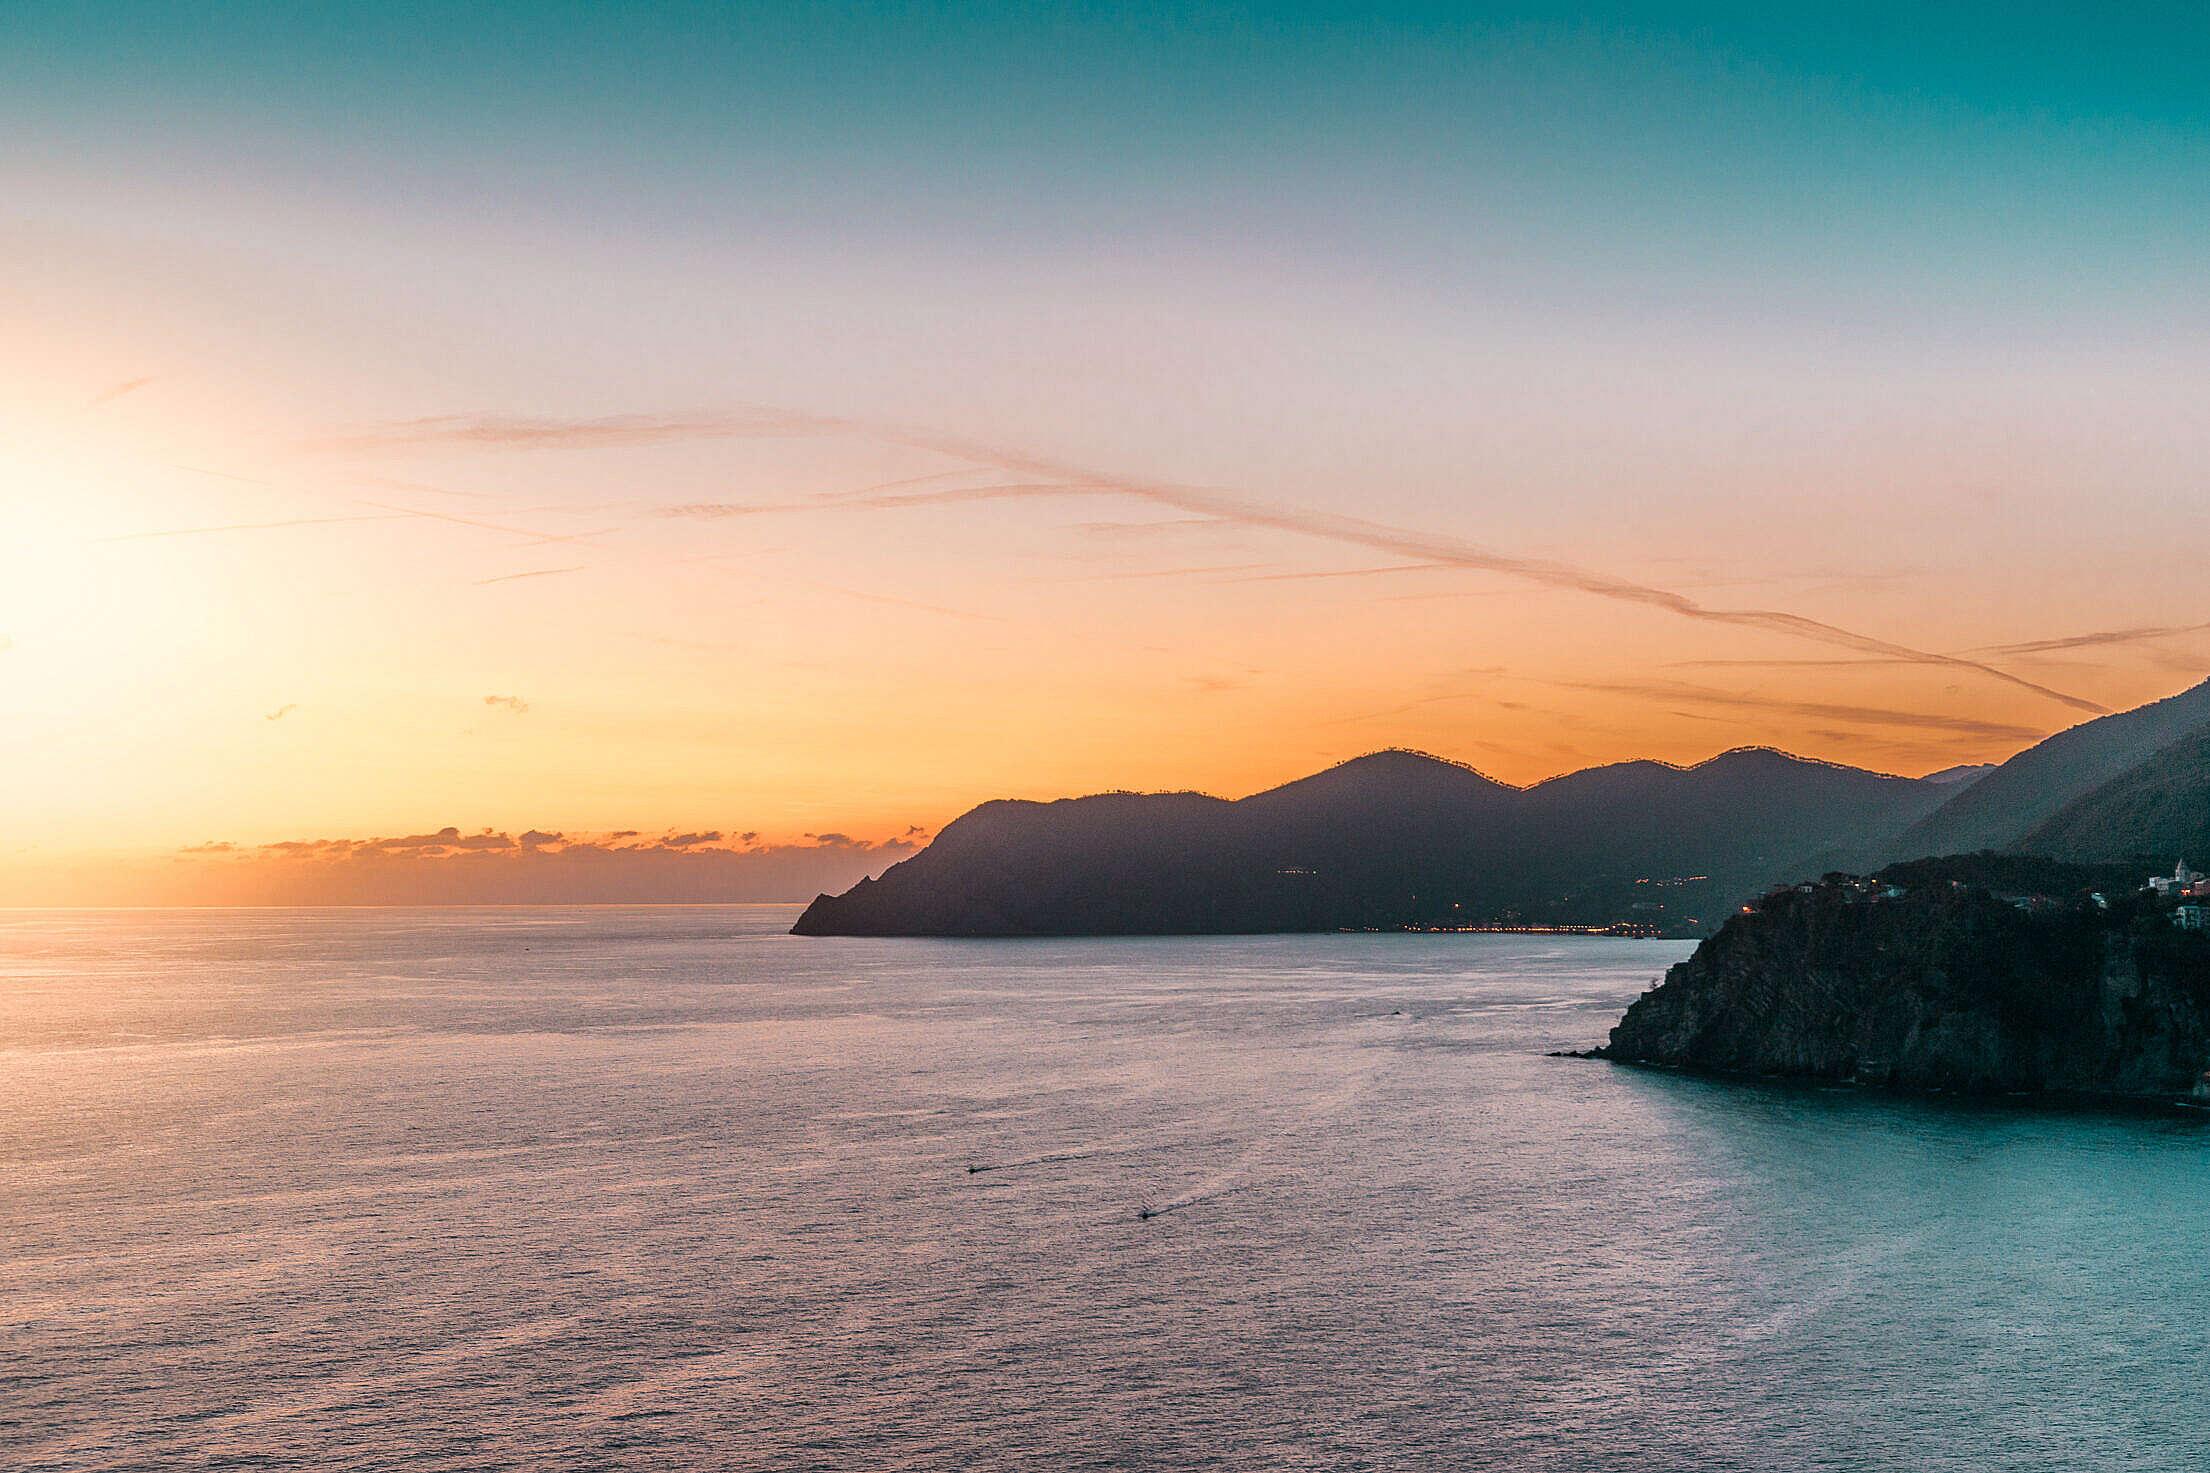 Sunset Coastline Free Stock Photo